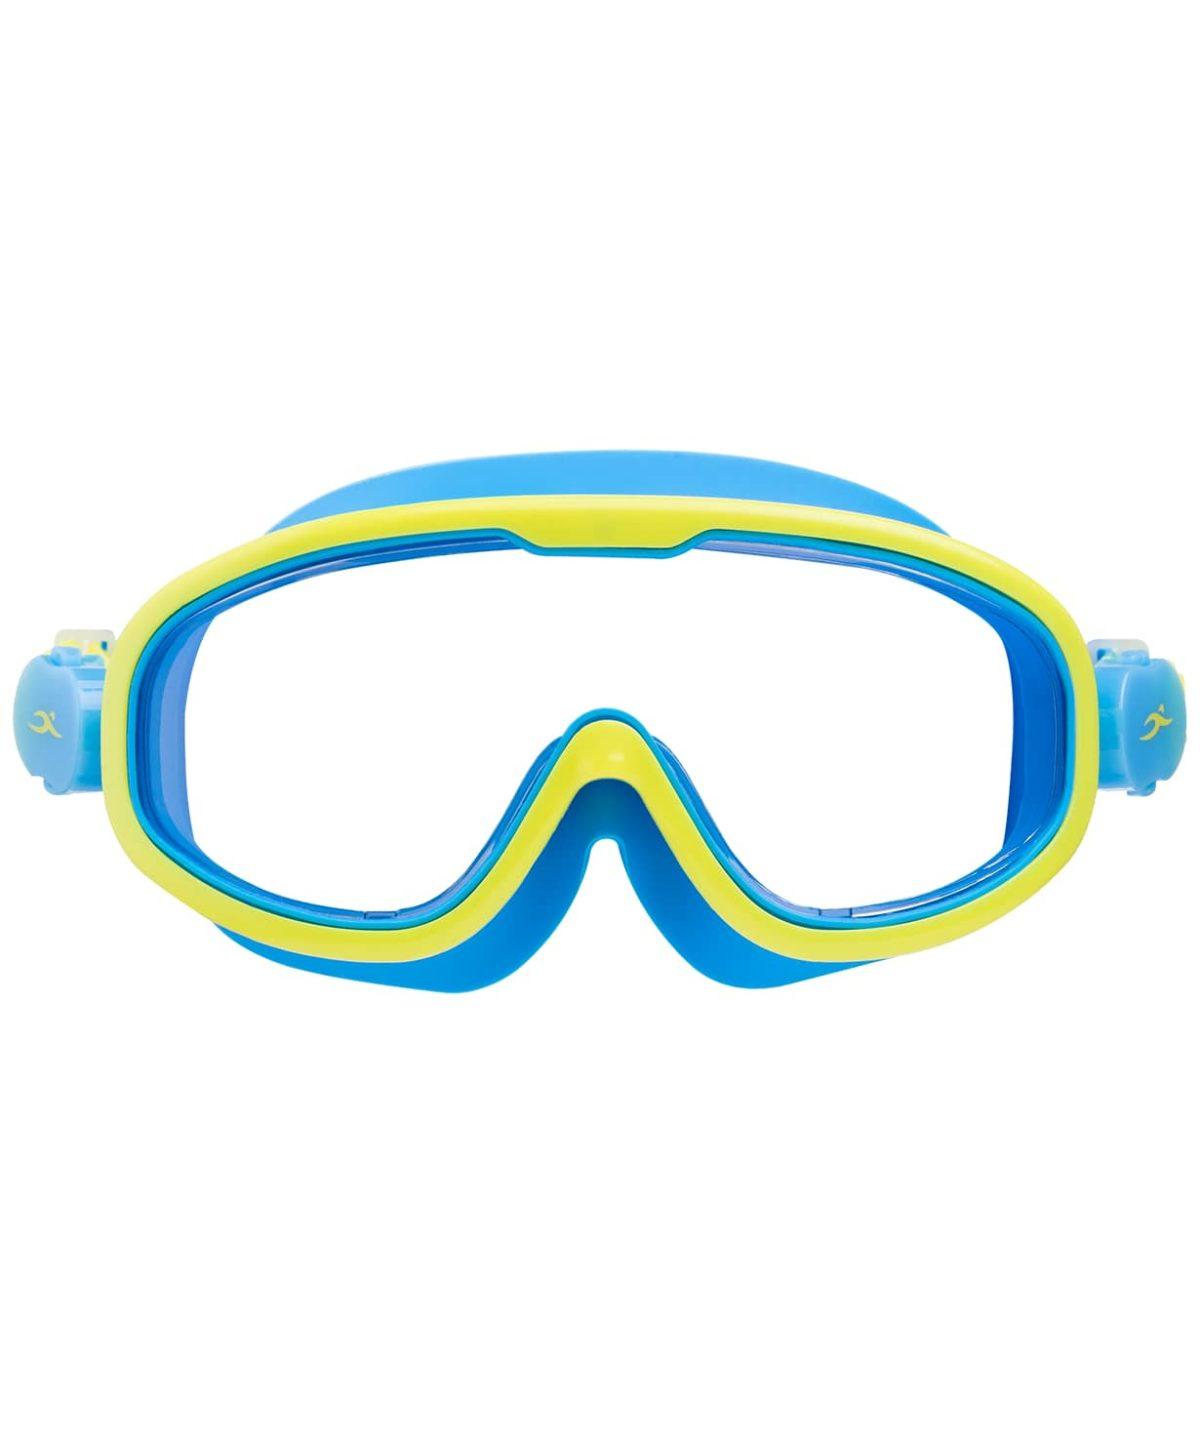 25DEGREES Очки-маска для плавания Hyper, детская  25D21018: голубой/лайм - 2